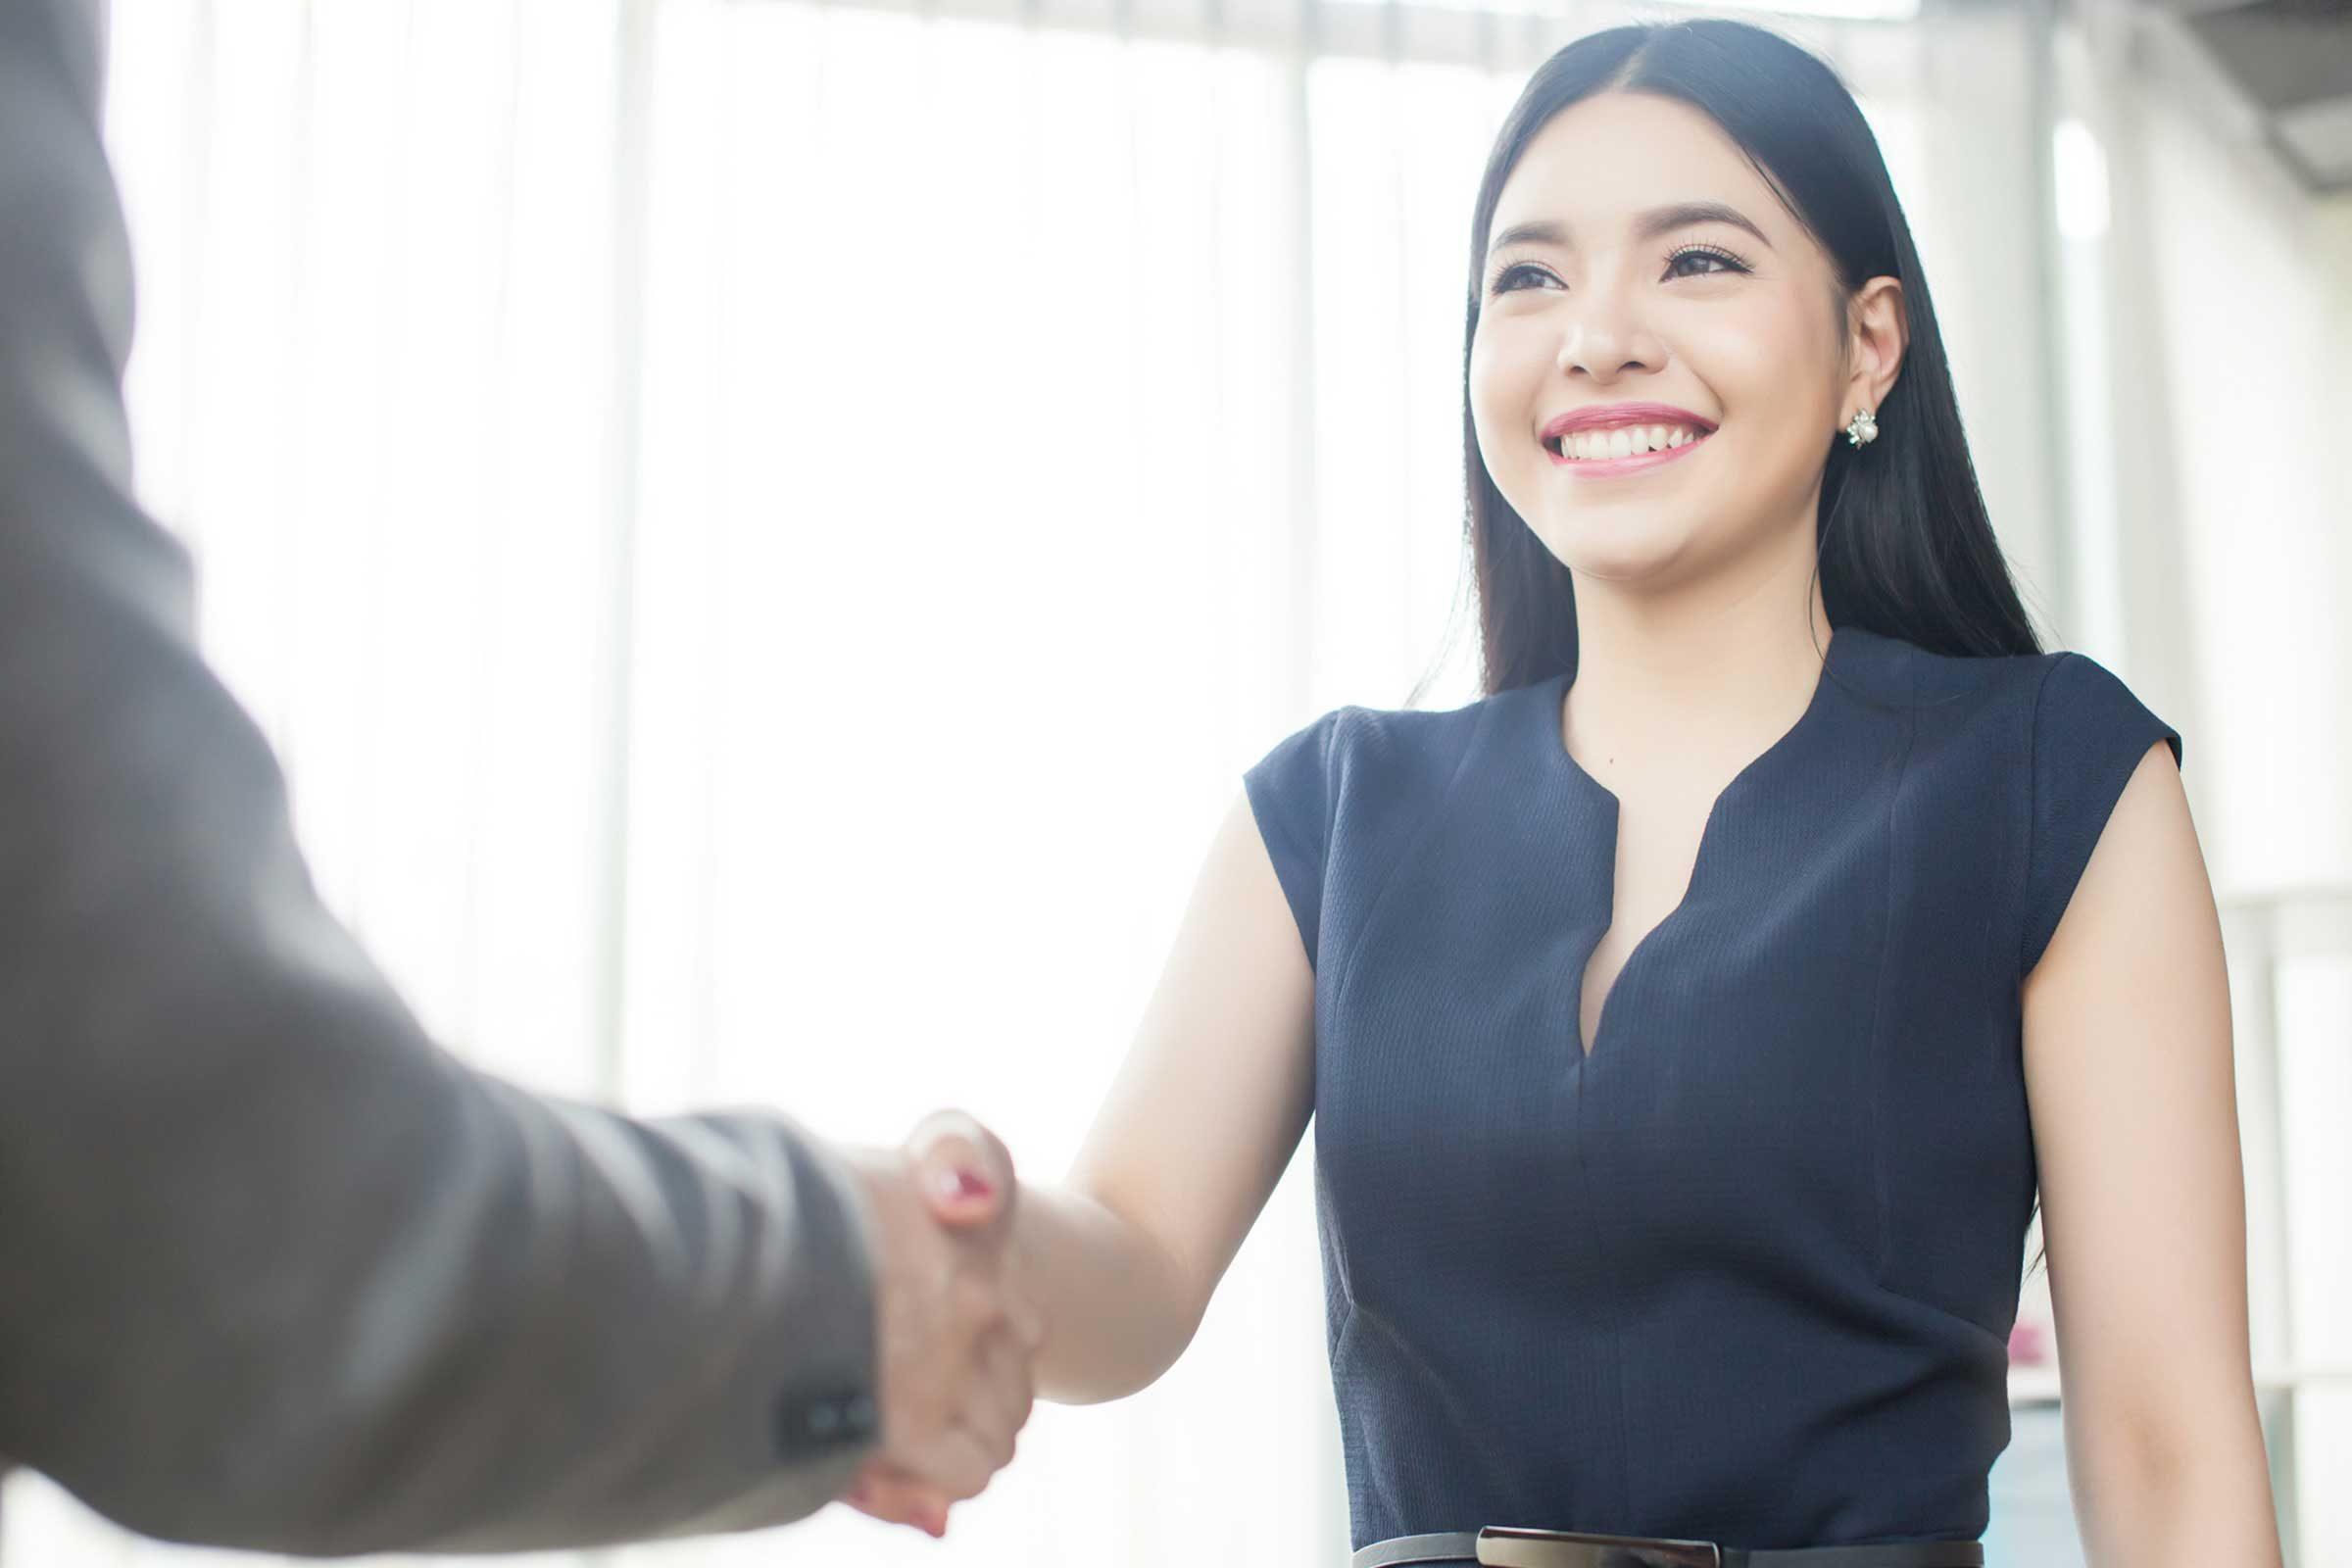 flirting moves that work body language video youtube free full